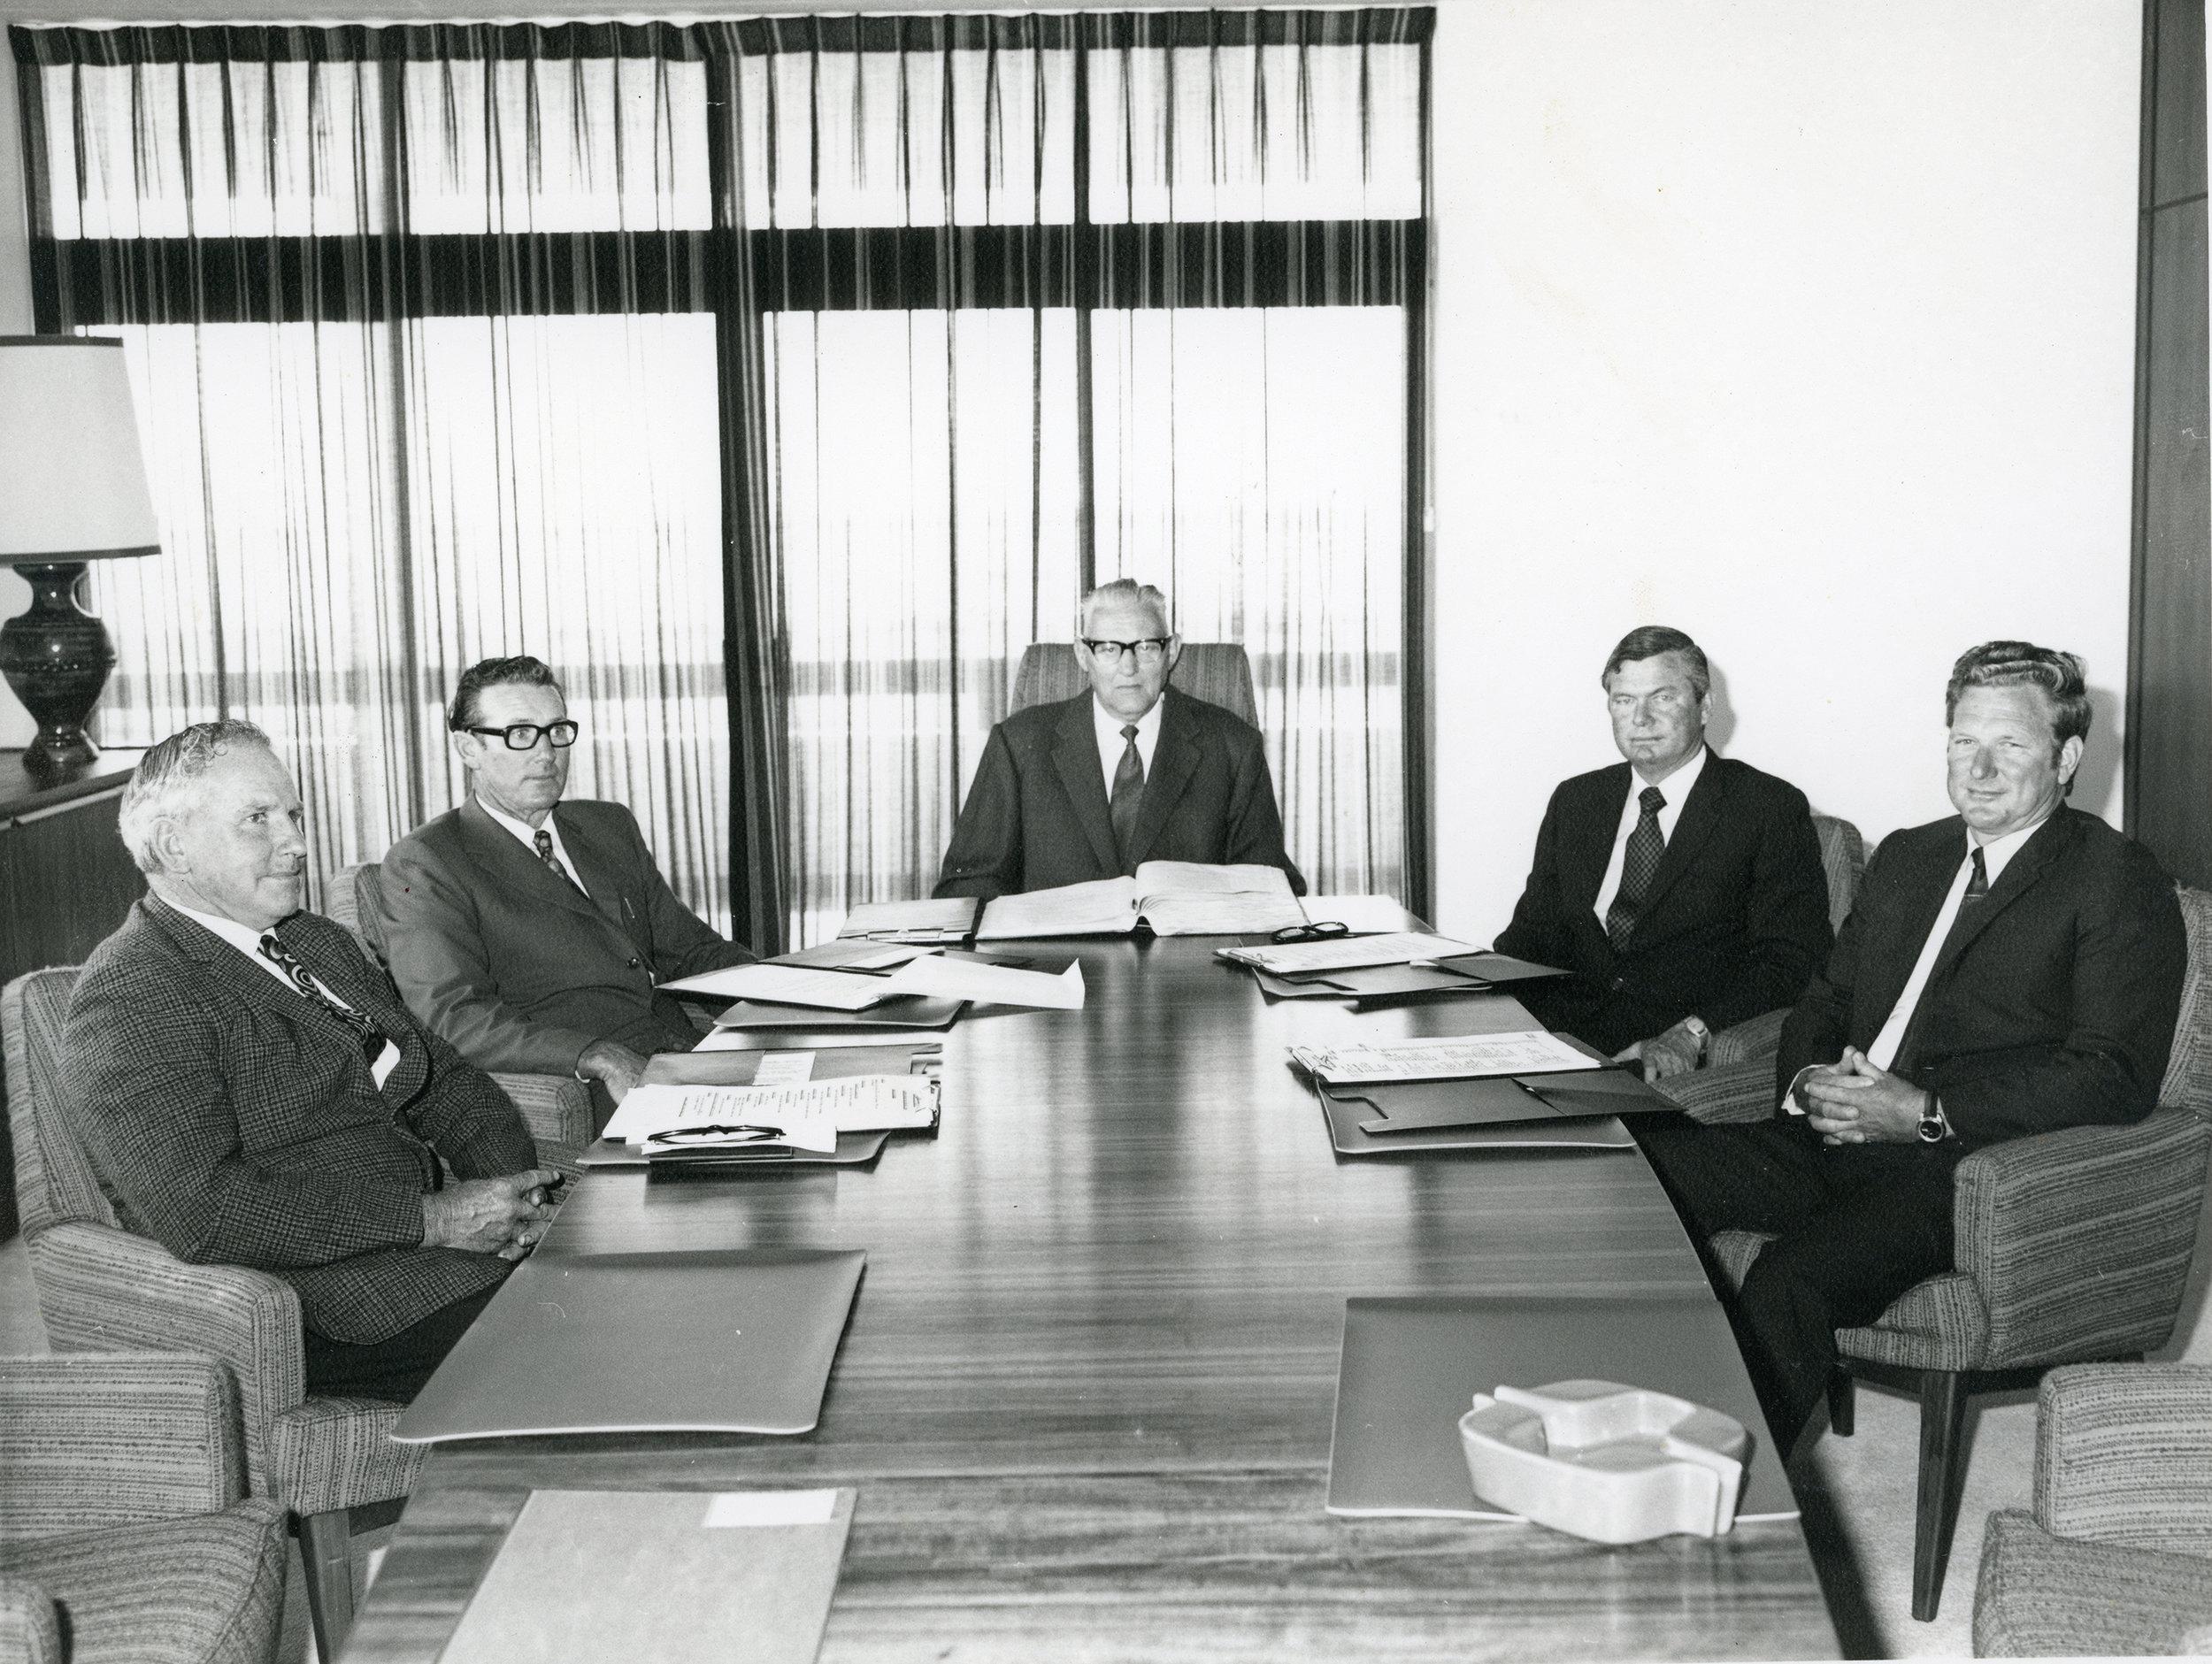 Inaugural founding five board members Bob Scott, Kevin Critch, Chairman Frank Lemmon, Ian Bogle and Alan Dutton.